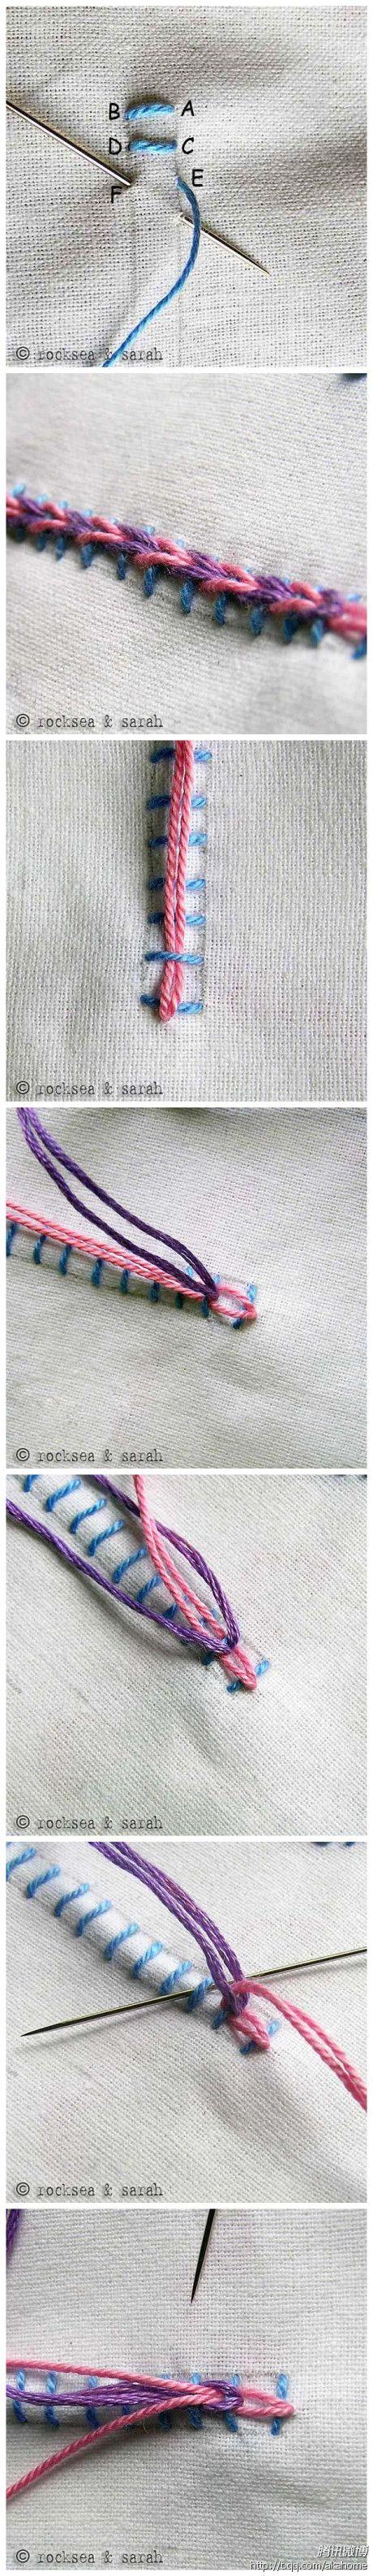 stitch: